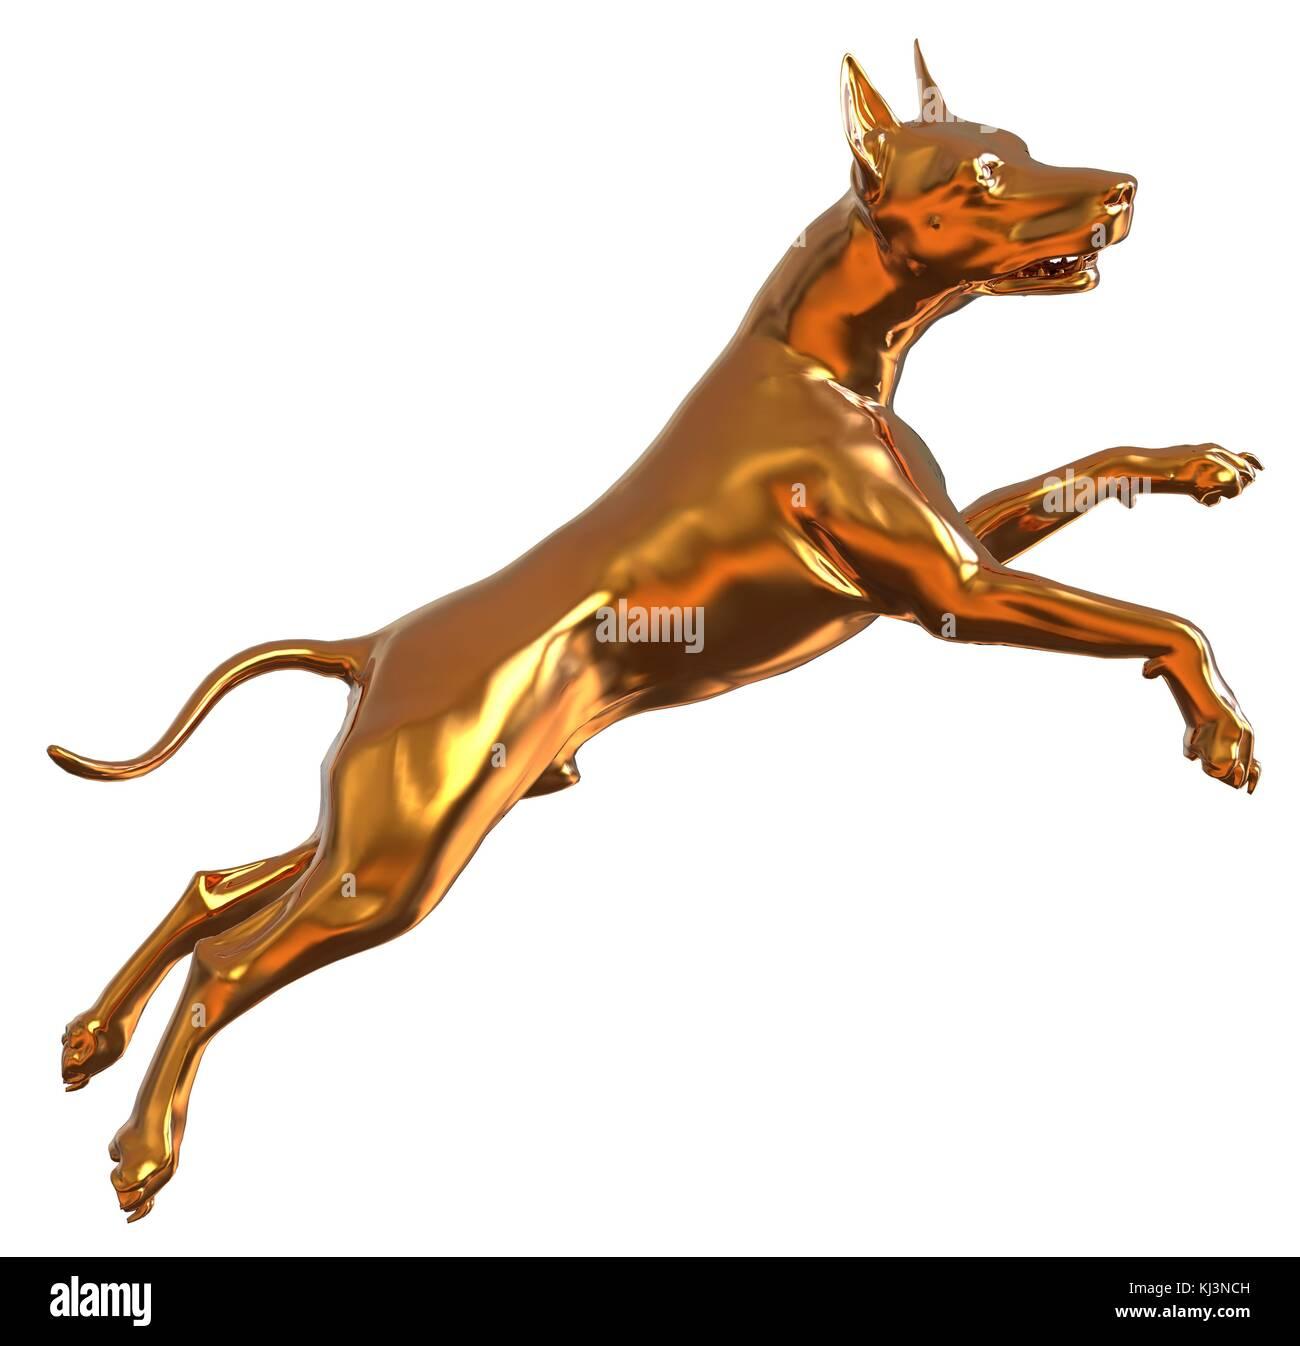 Golden Yellow Dog 3D Illustration Isolated On White - Stock Image